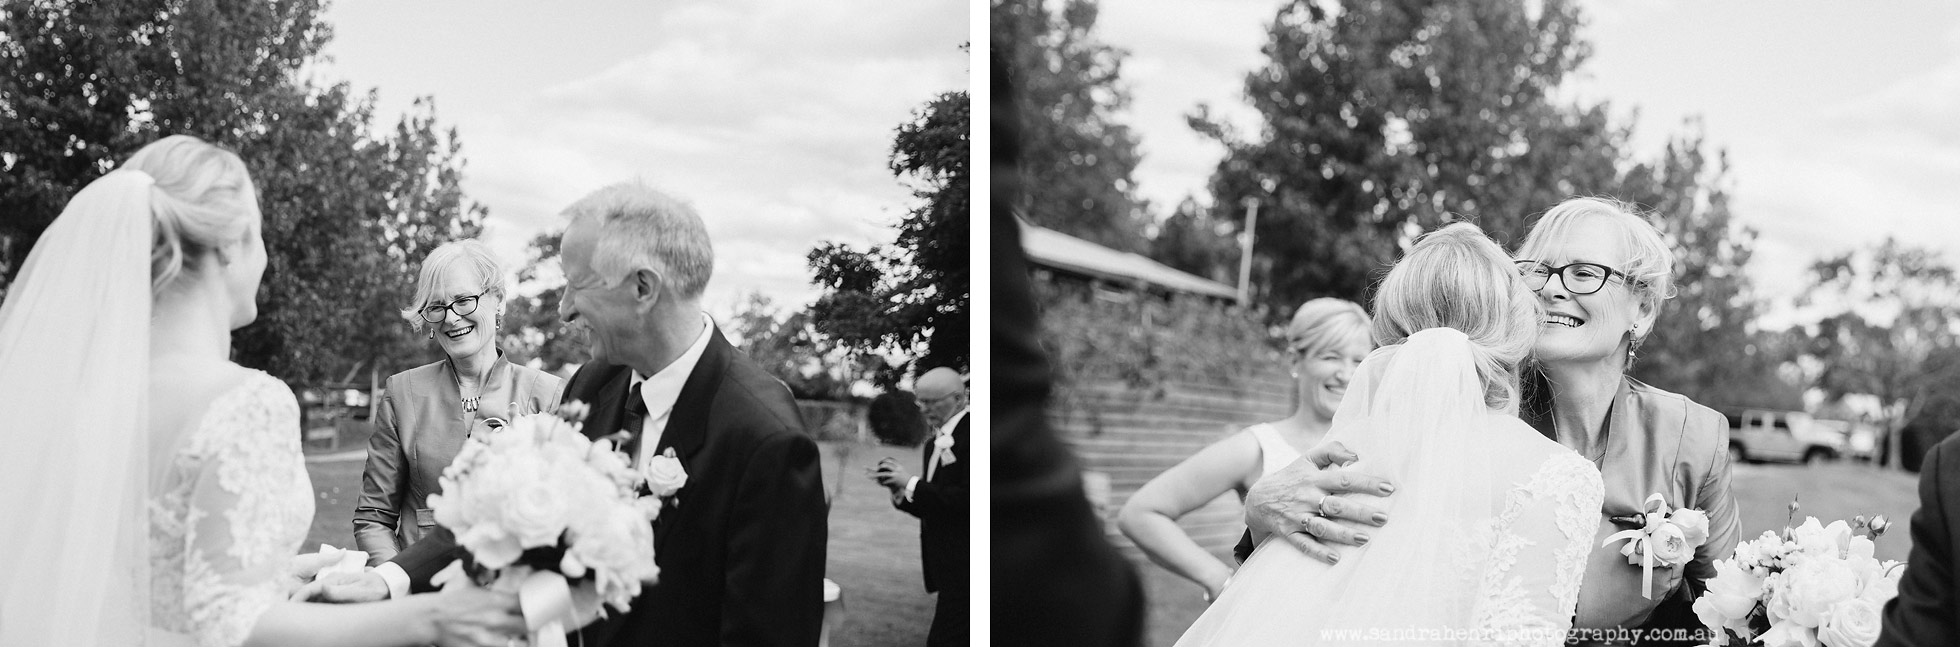 Roberts-Restaurant-garden-wedding-images-21.jpg